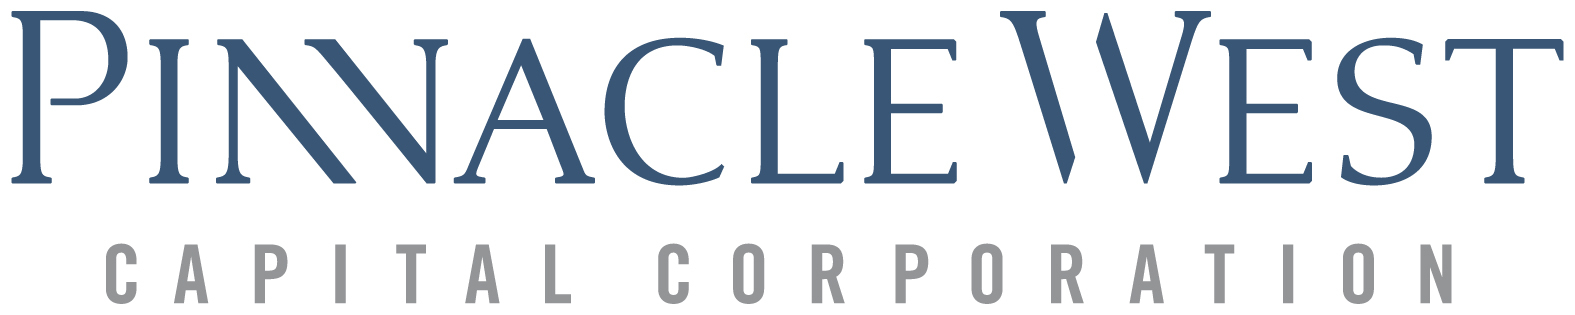 Pinnacle West Capital Corp.